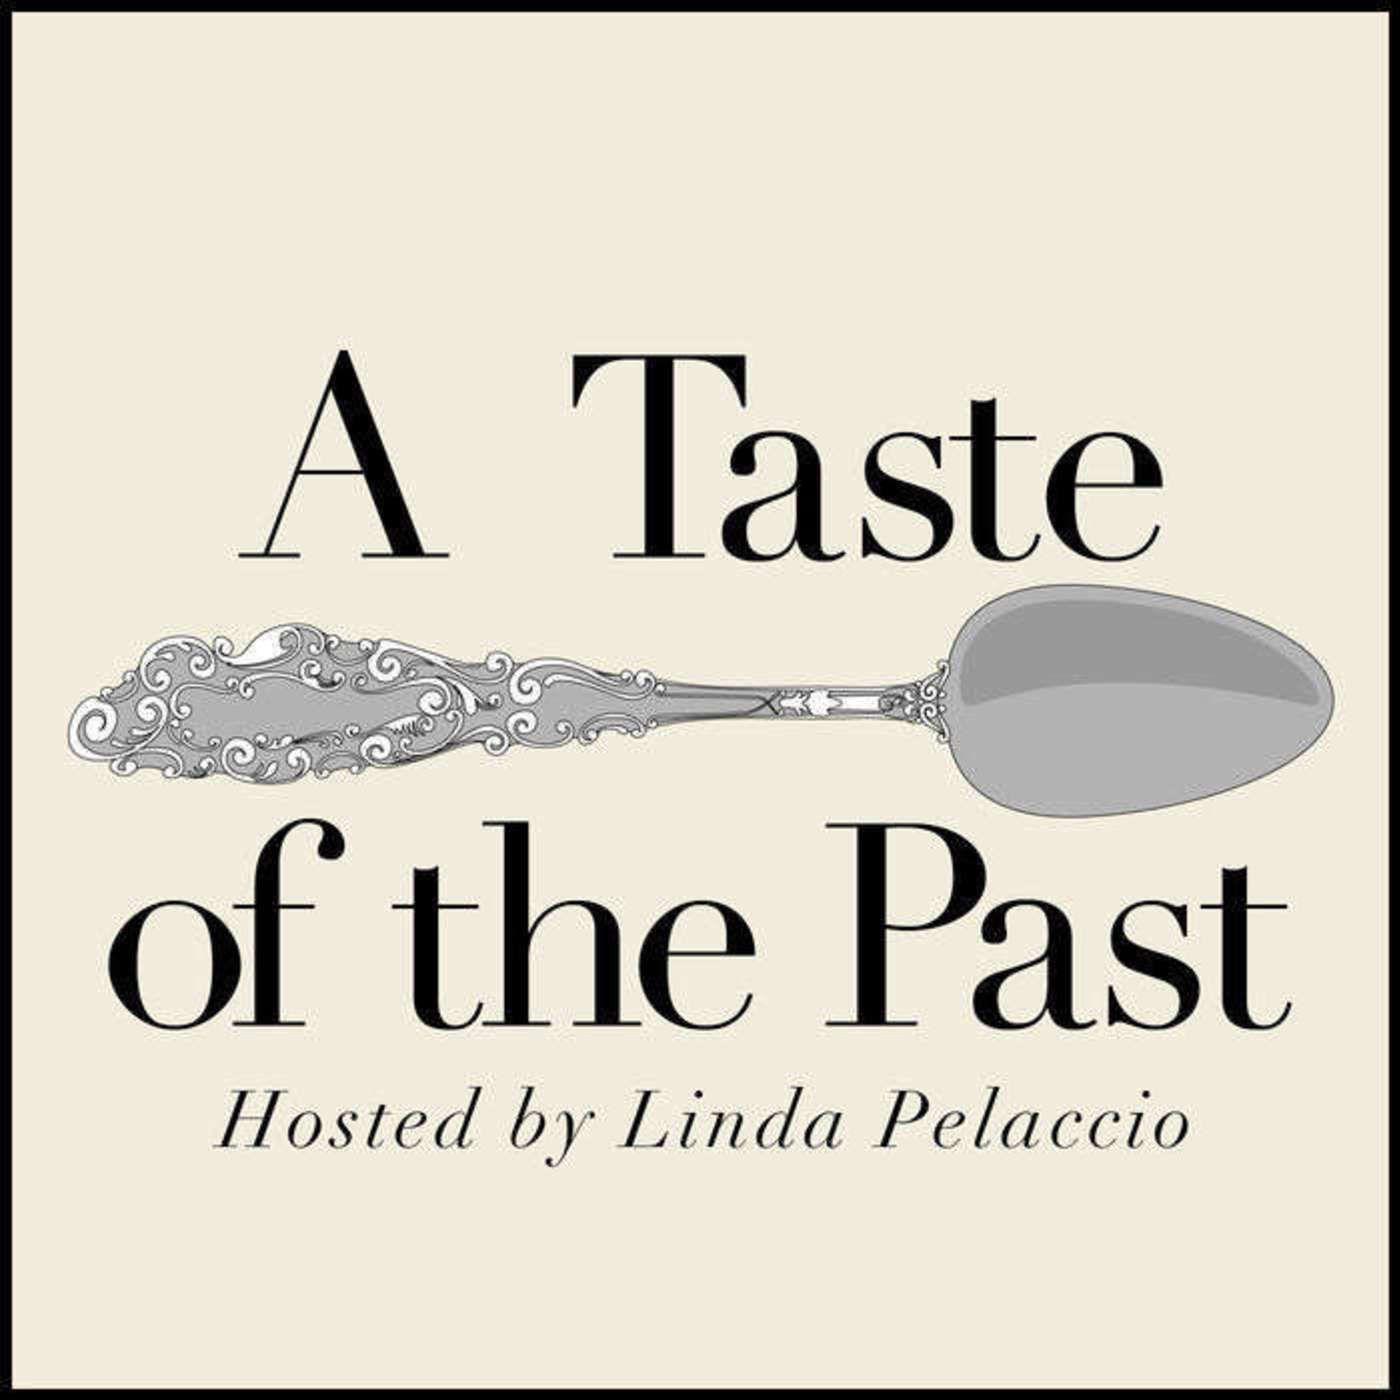 Episode 156: Robert Sietsema on The History of Pizza